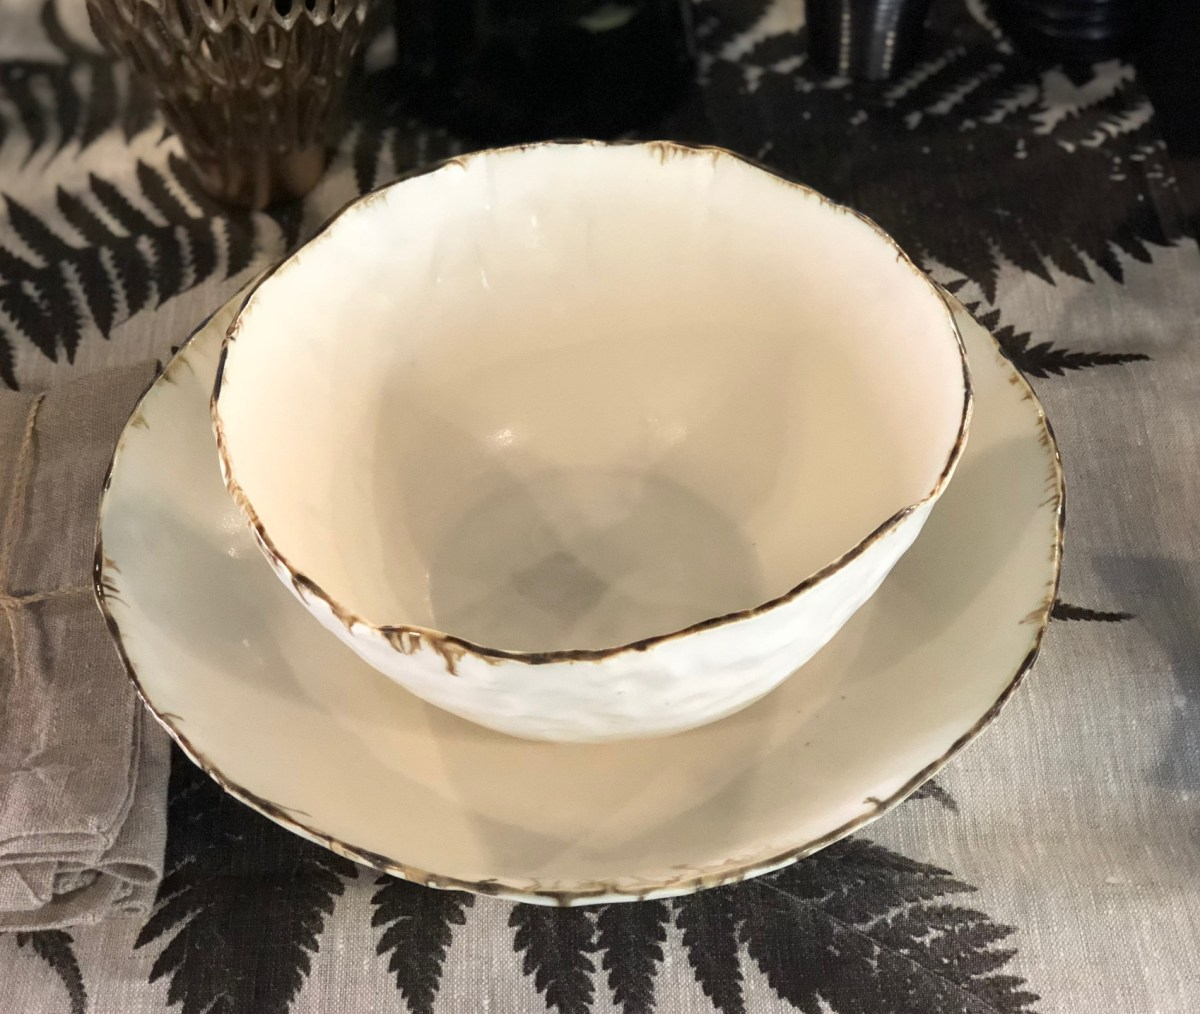 tablesetting-ferns-tourmaline-artefactboston